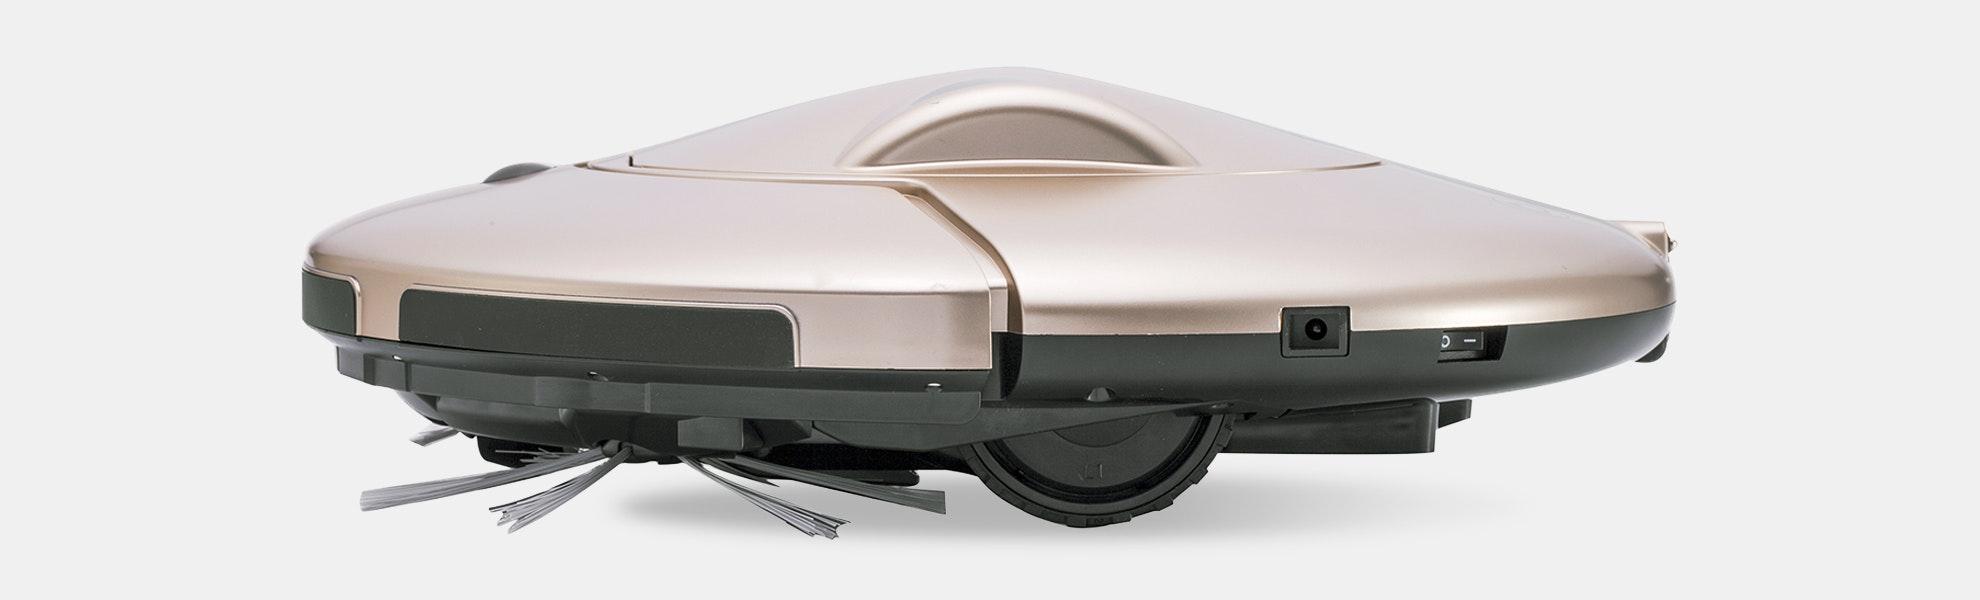 Techko Kobot RCS212 Robotic Cleaning System